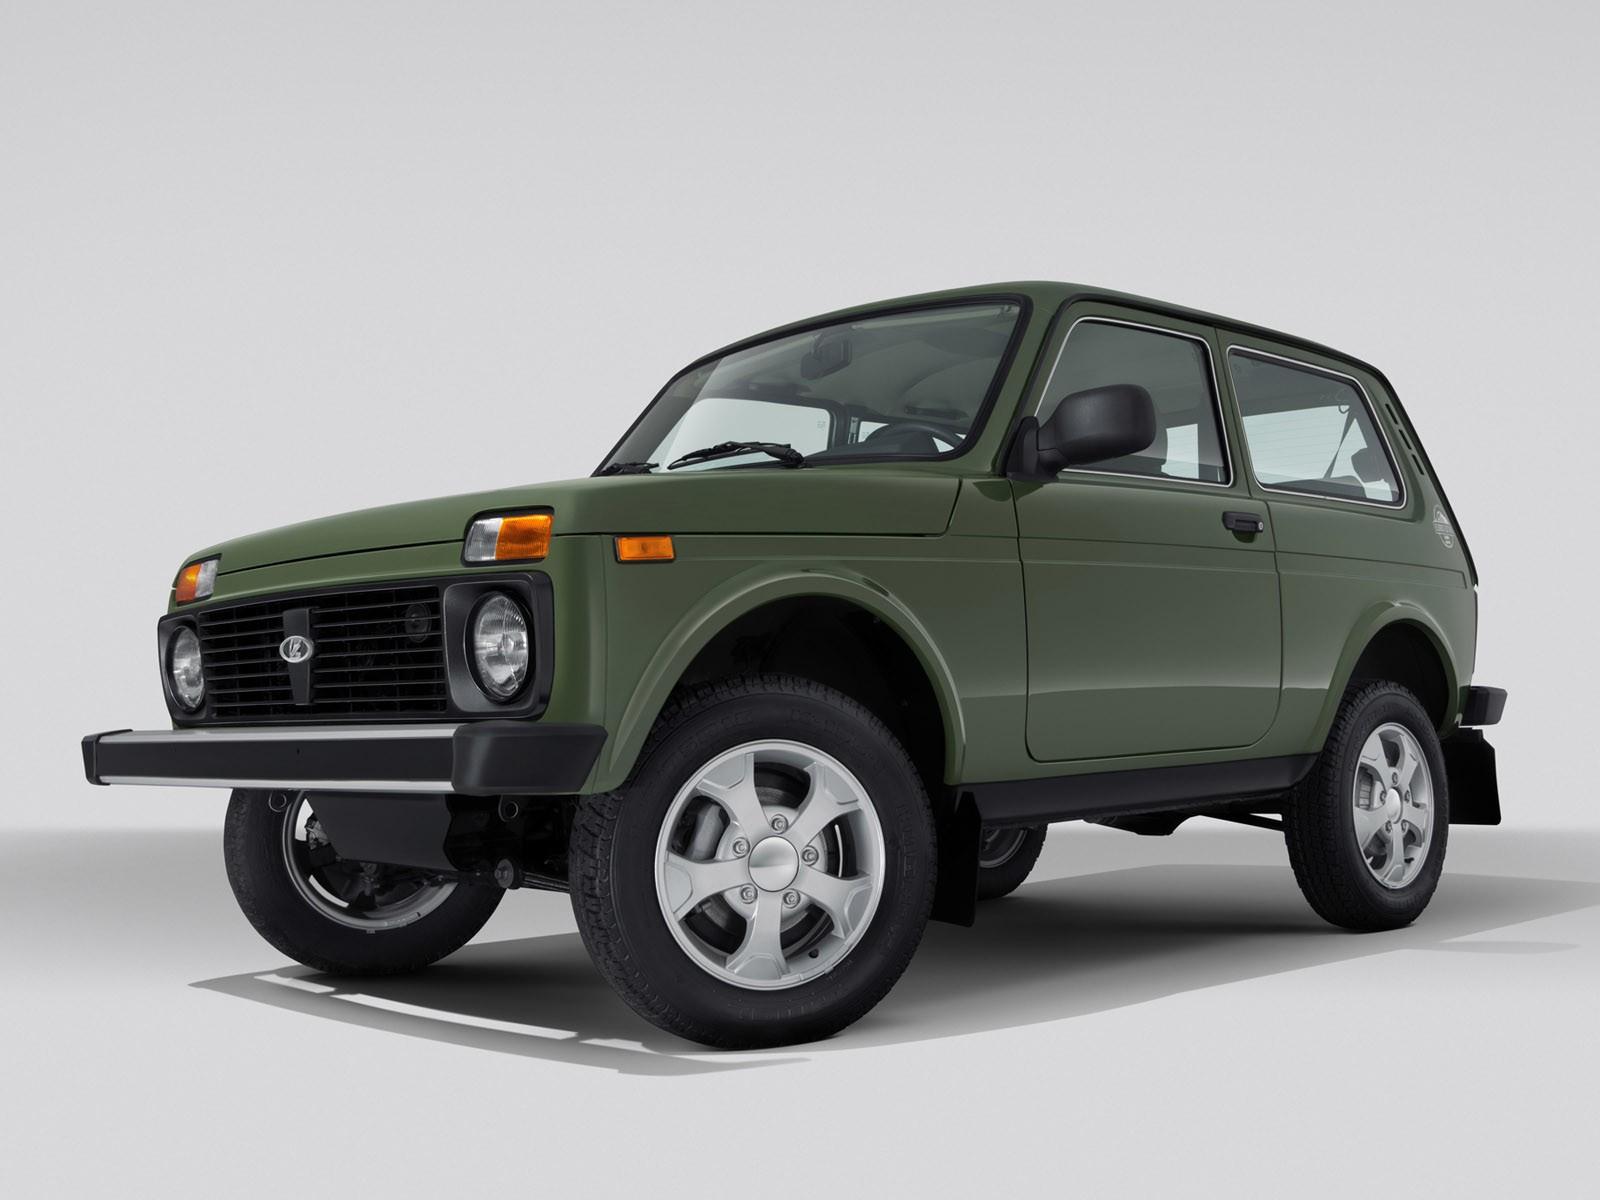 2015 Lada 4x4 Elbrus Edition 21214